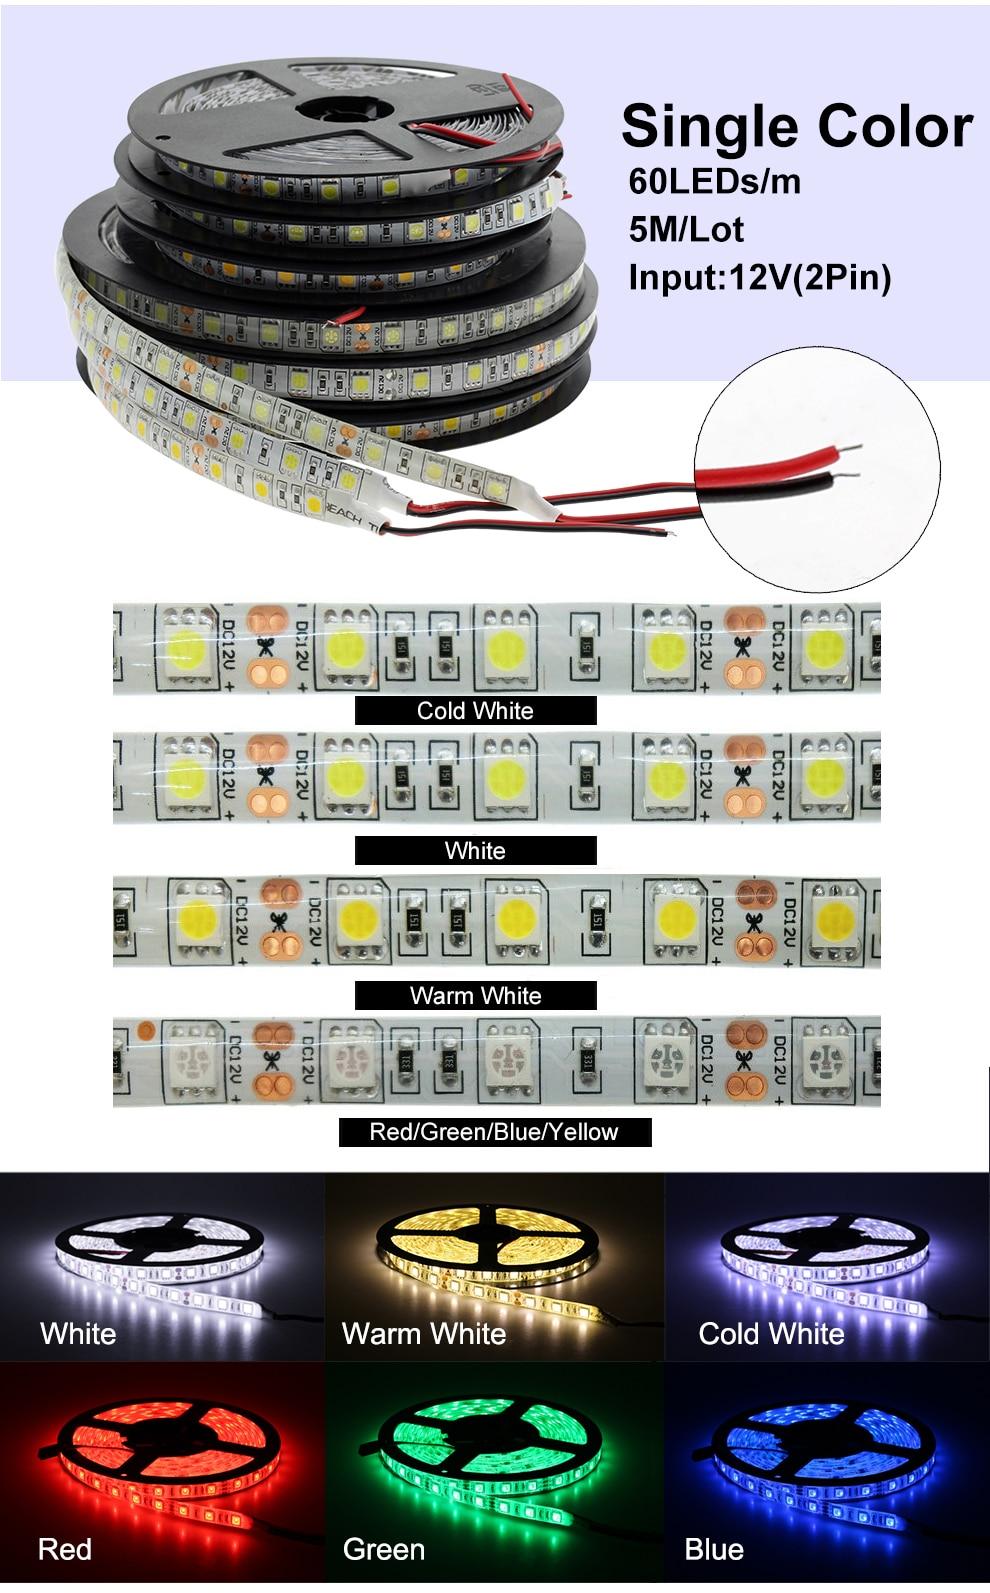 HTB1pZoTKbuWBuNjSszgq6z8jVXaF LED Strip 5050 DC12V 60LEDs/m Flexible LED Light RGB RGBW 5050 LED Strip 300LEDs 5m/lot